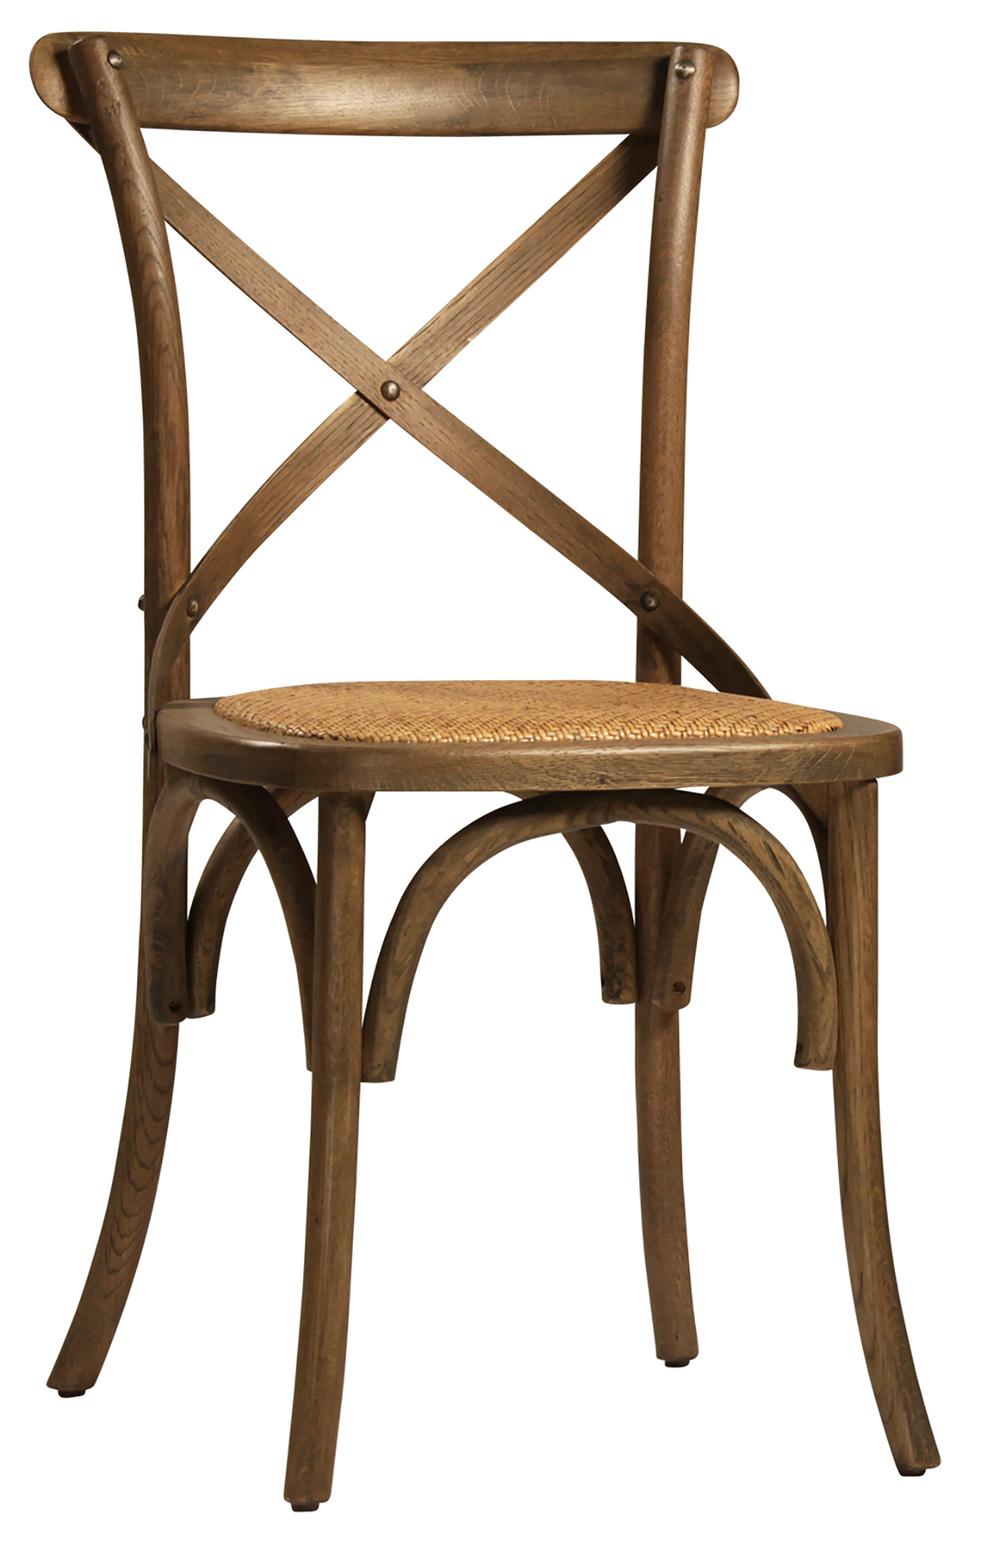 Dovetail Furniture - Gaston Dining Chair